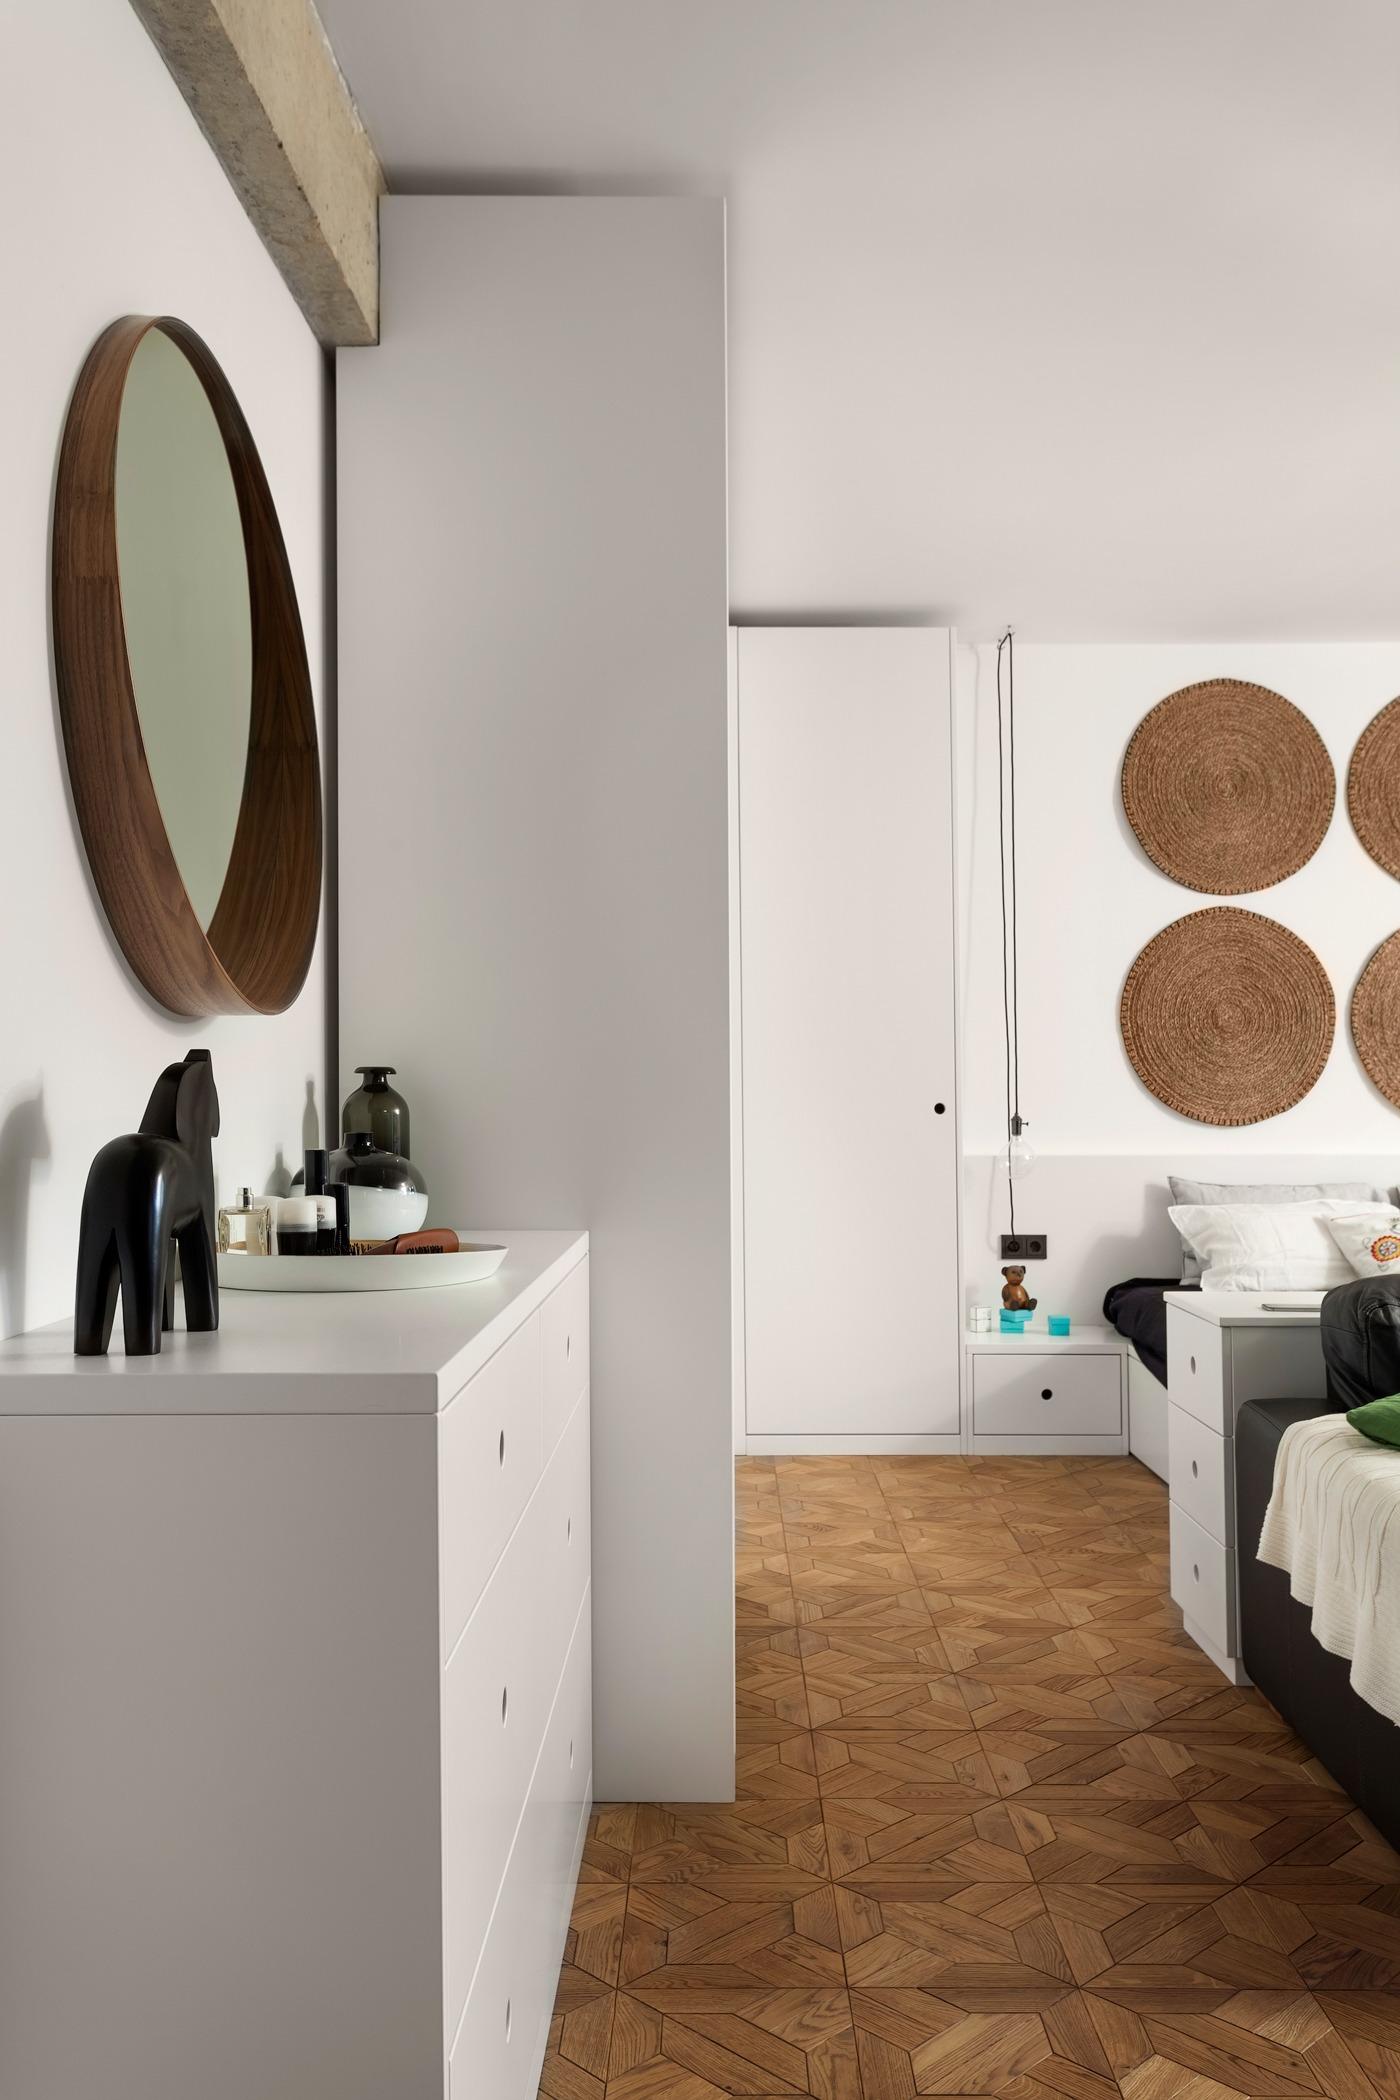 round-decor-inspiration